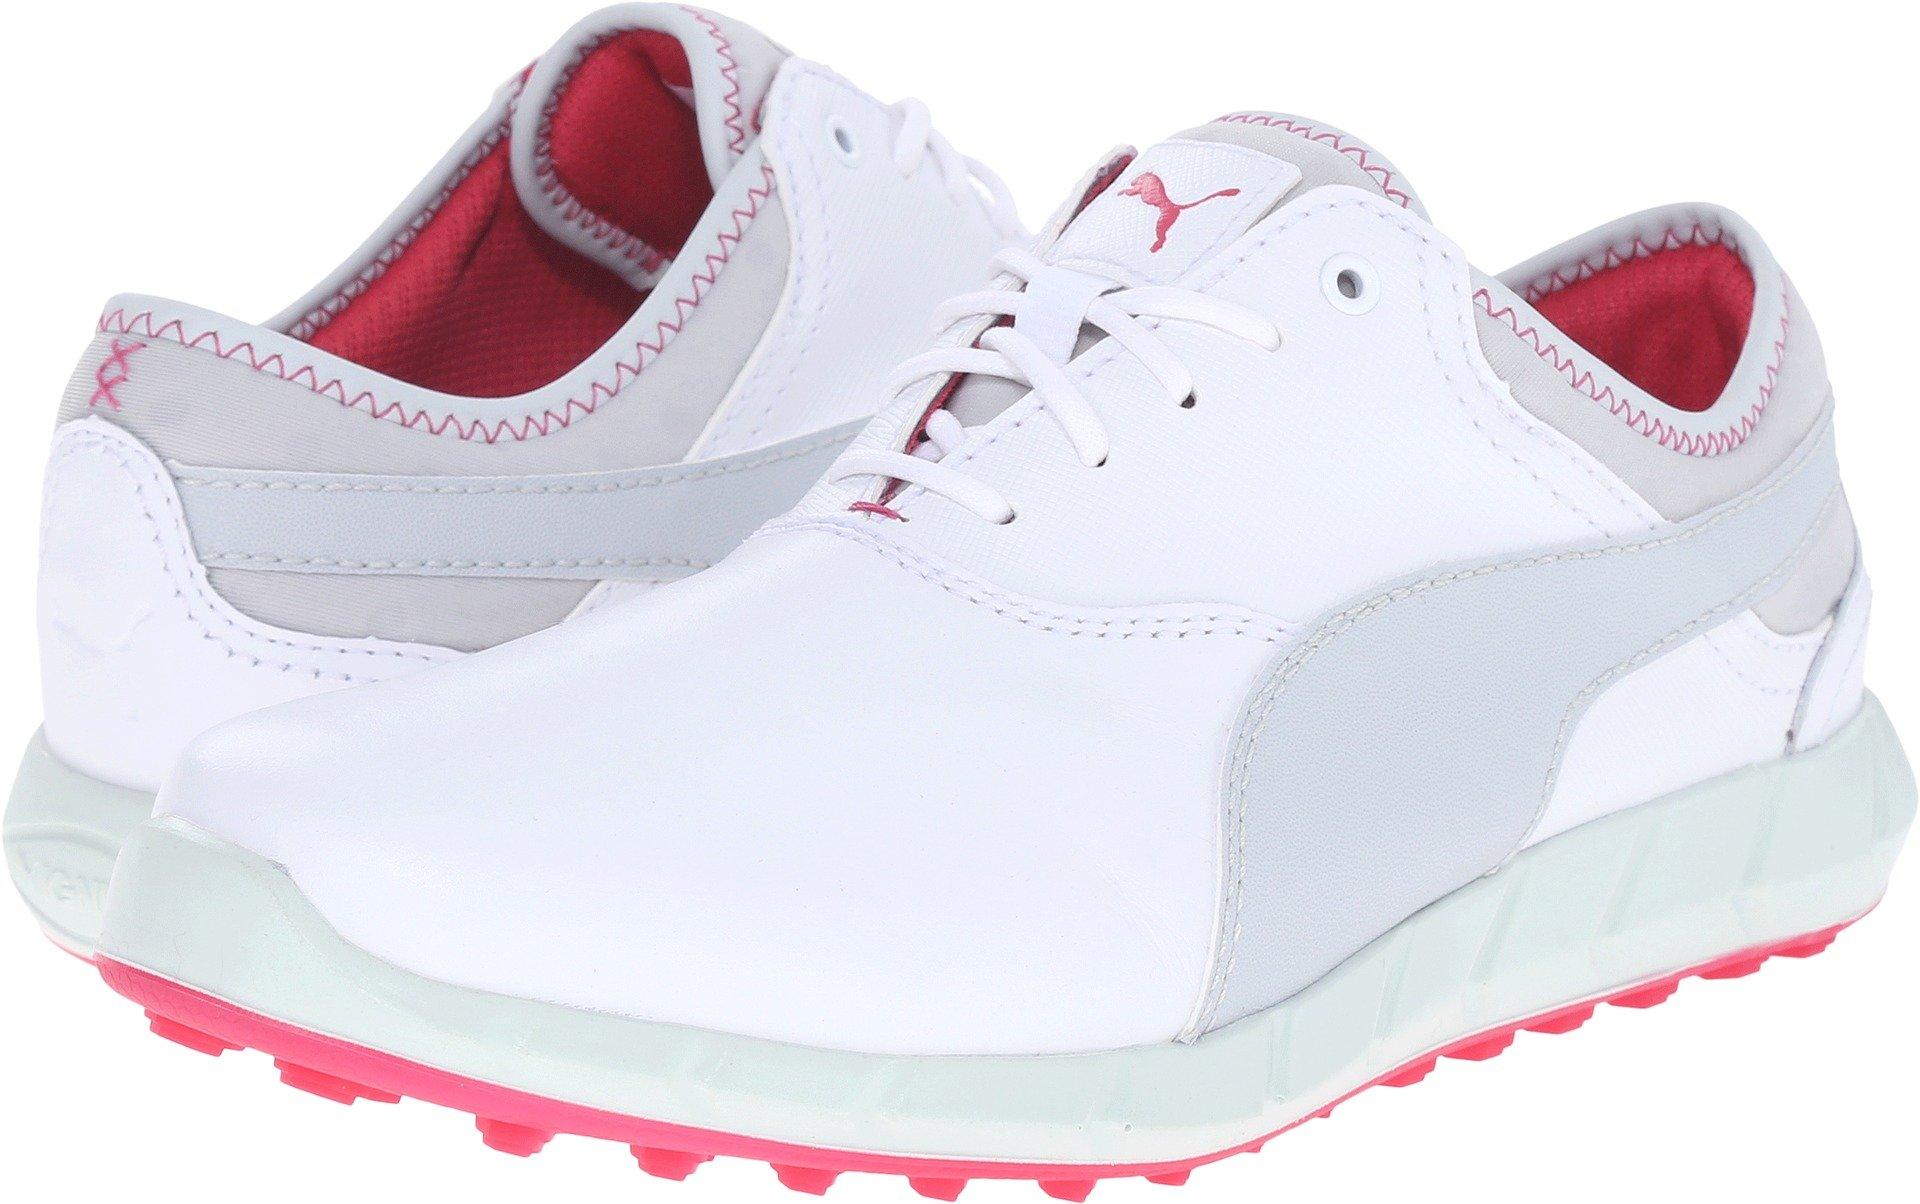 PUMA Golf Women's Ignite Golf White/Glacier Gray/Rose Red Sneaker 5.5 B (M)